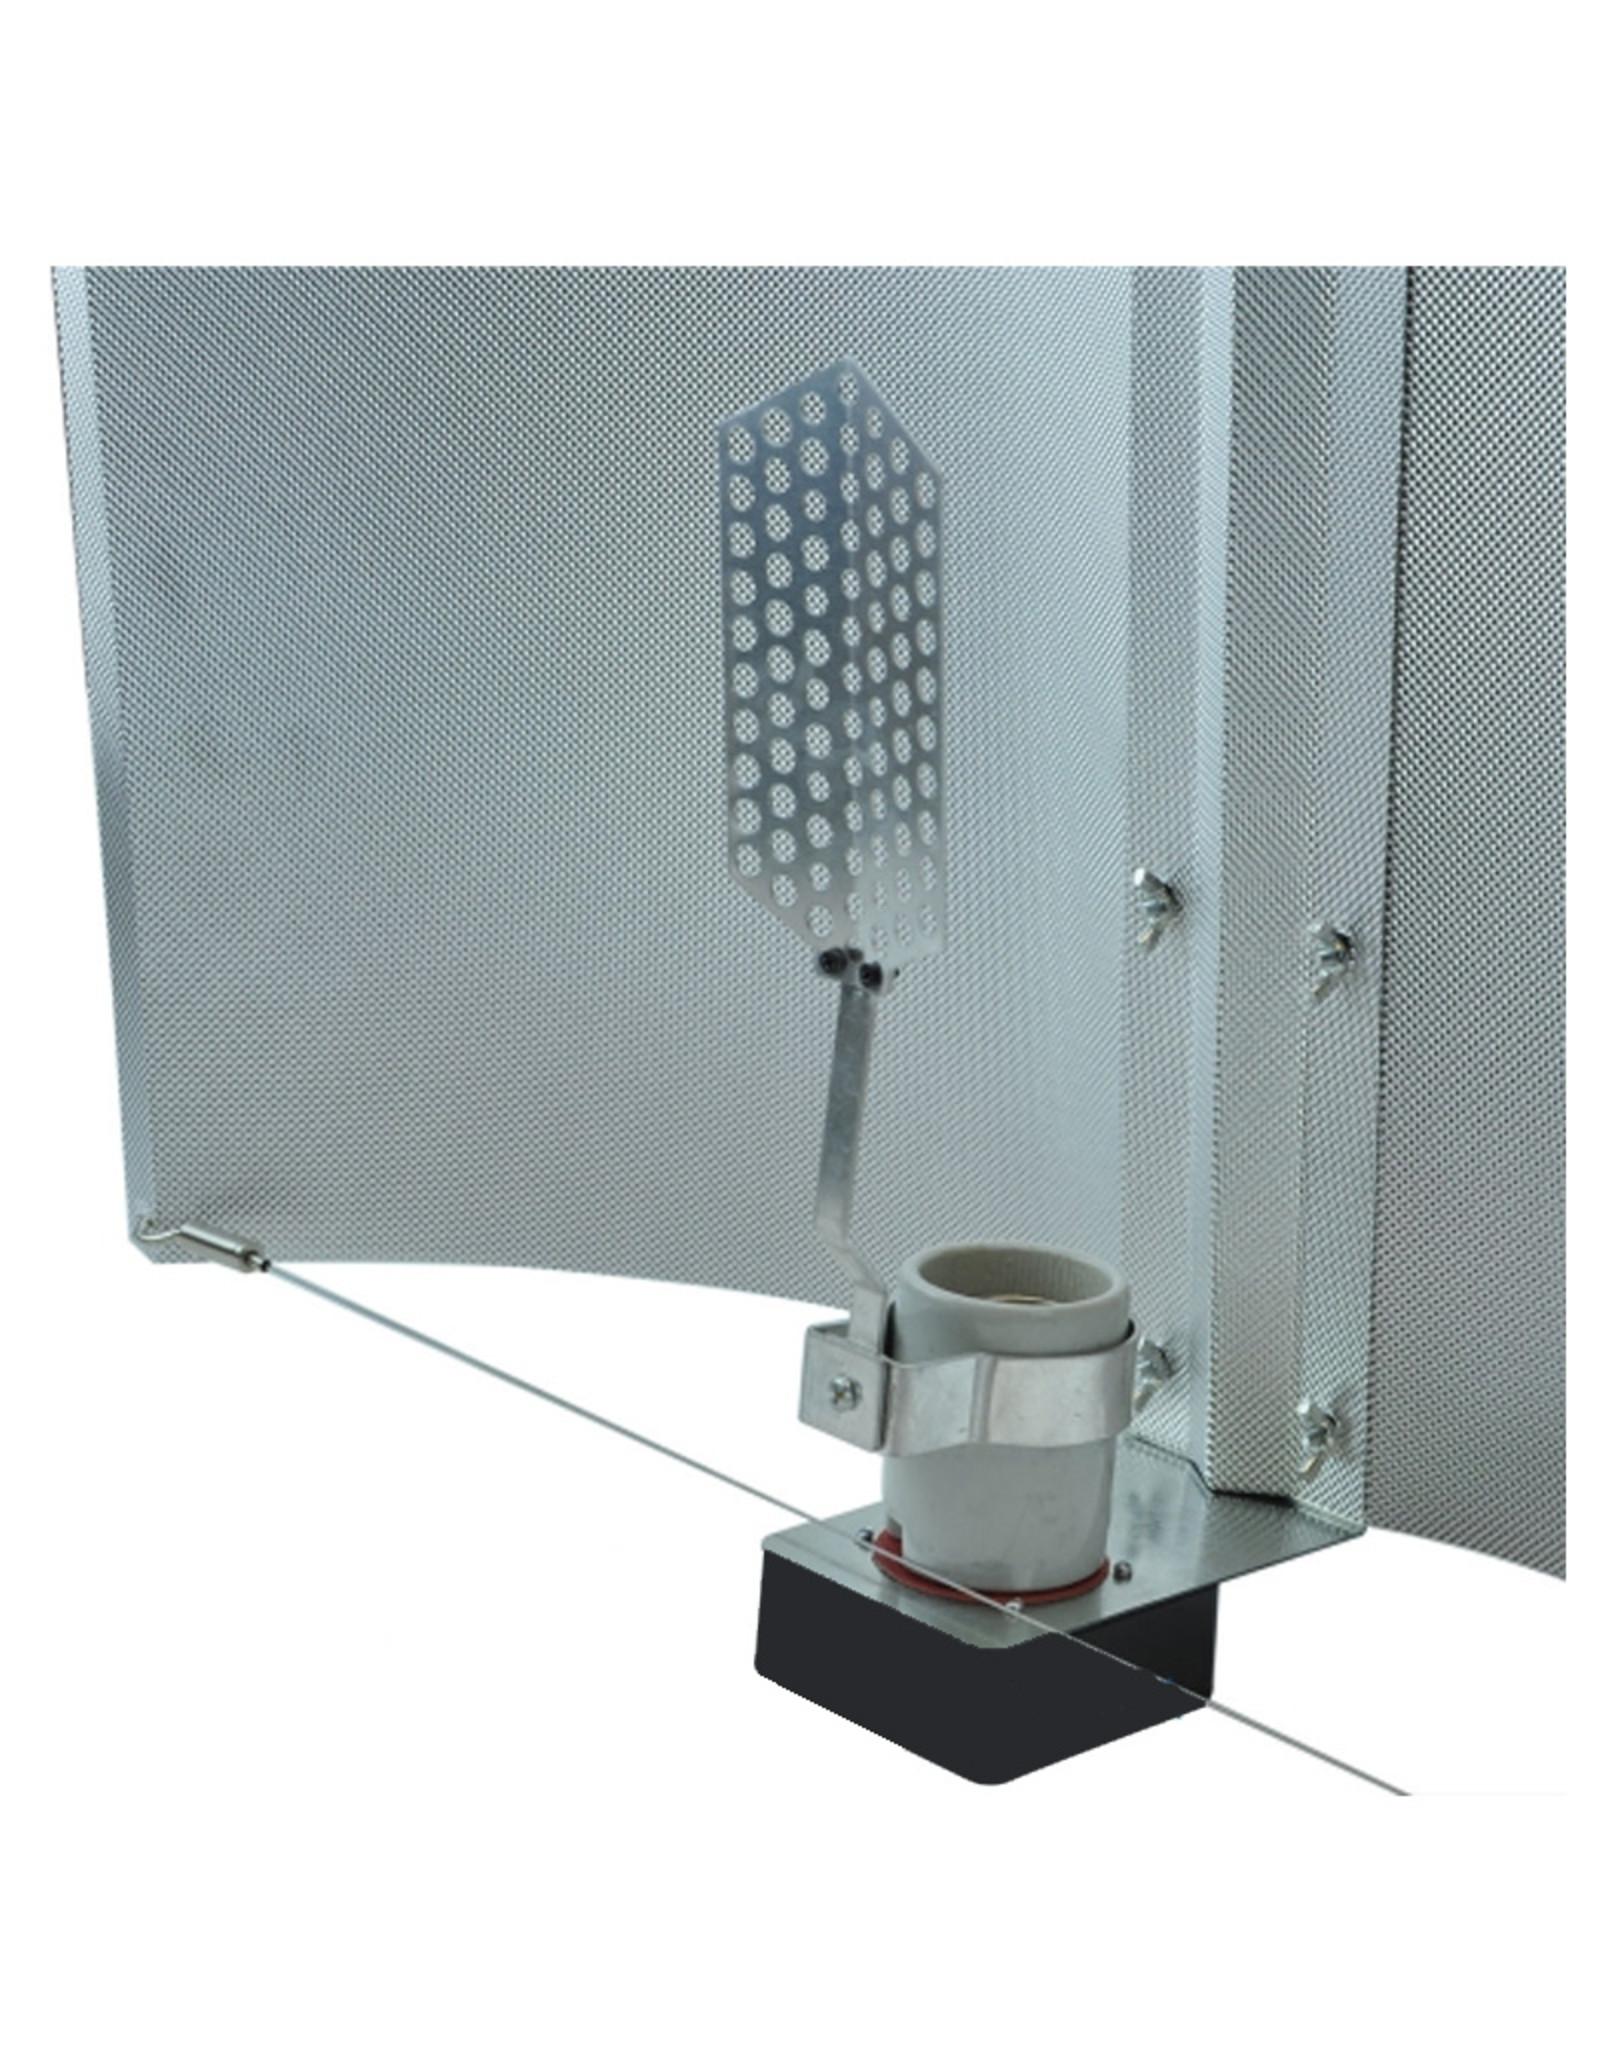 TRINATECH ADJUST-A-GLIDE REFLECTOR